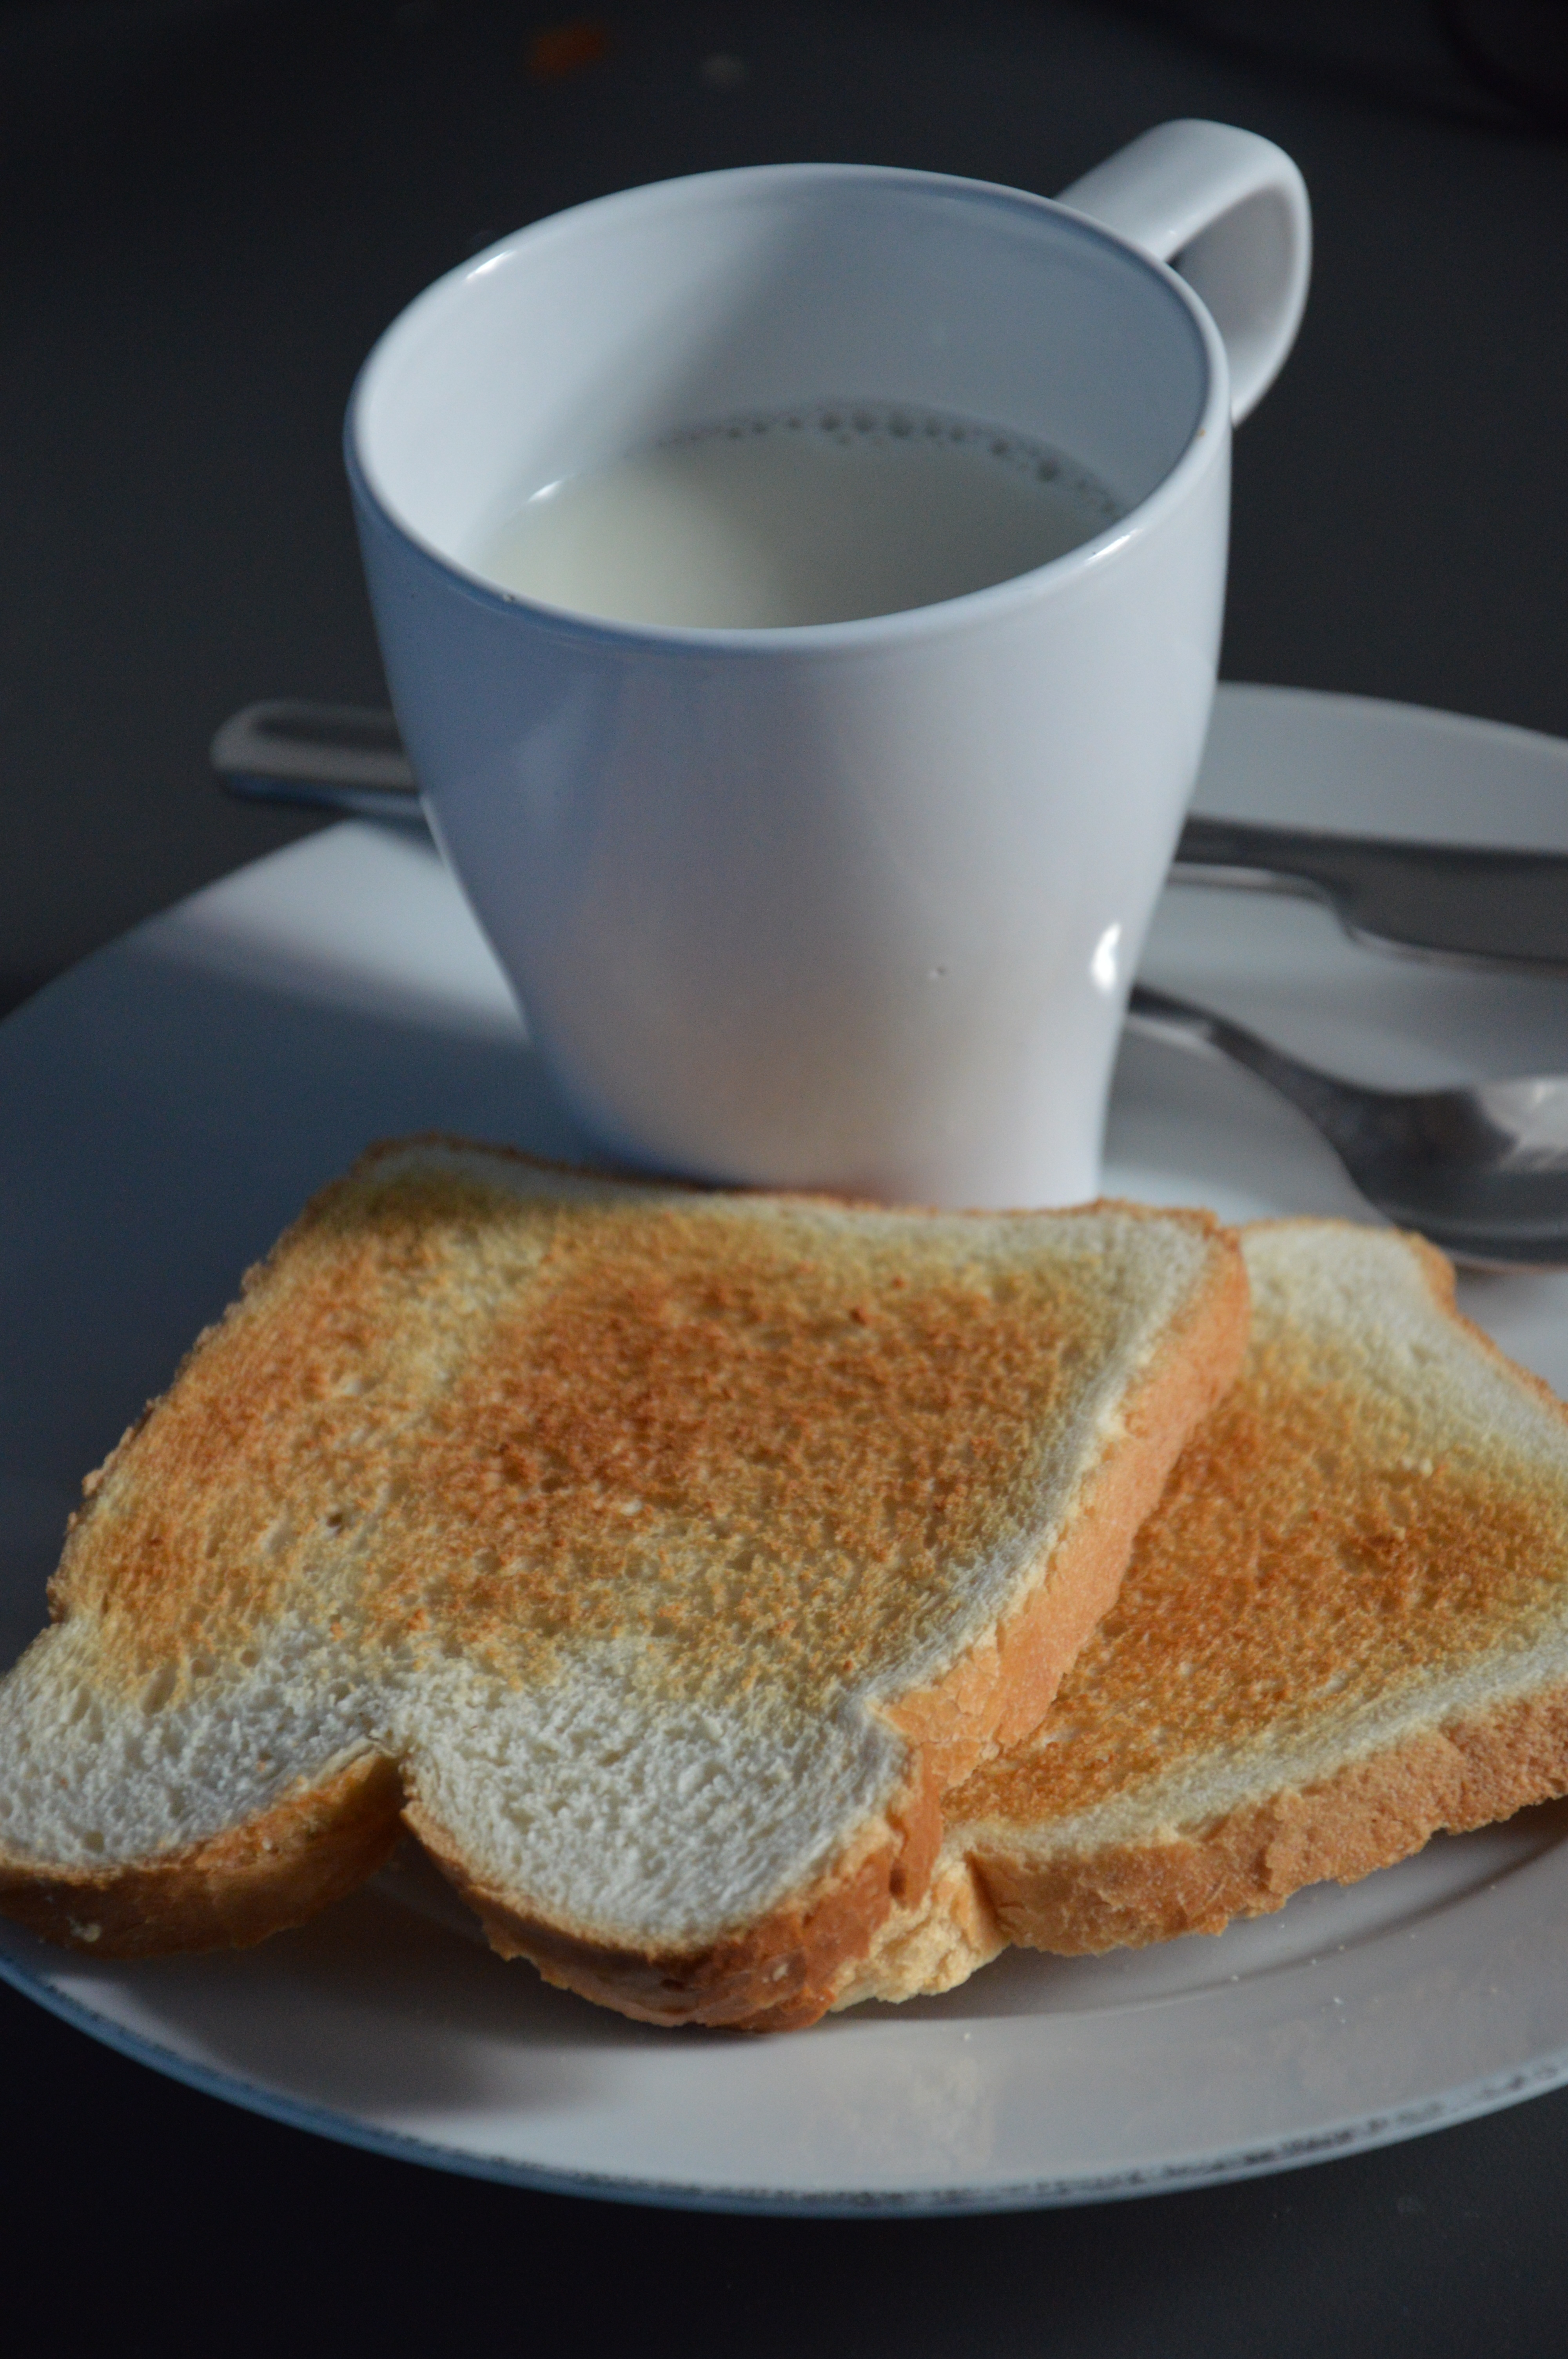 Breakfast, Bread, Coffee, Energy, Food, HQ Photo